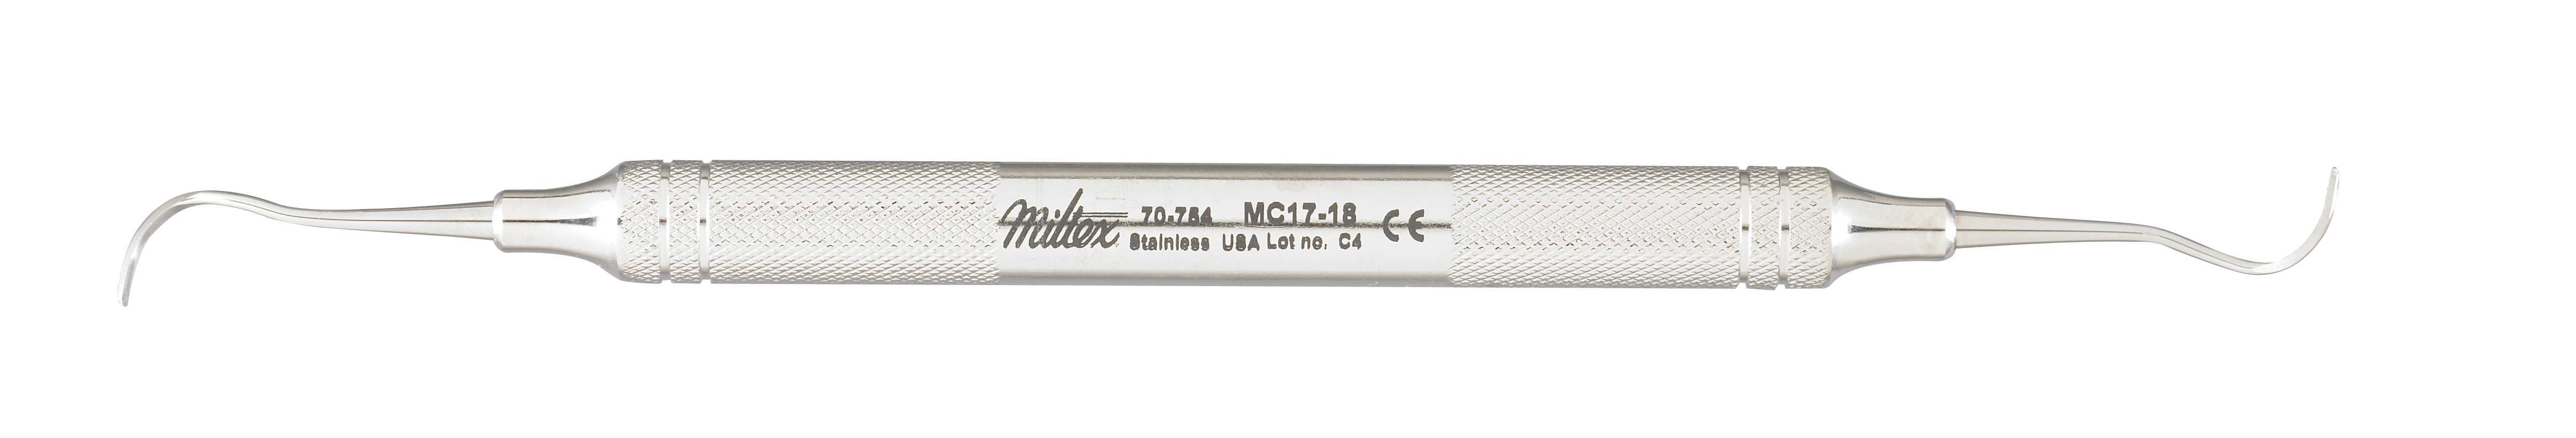 mccall-17-18-cur-6-hndle-70-754-miltex.jpg